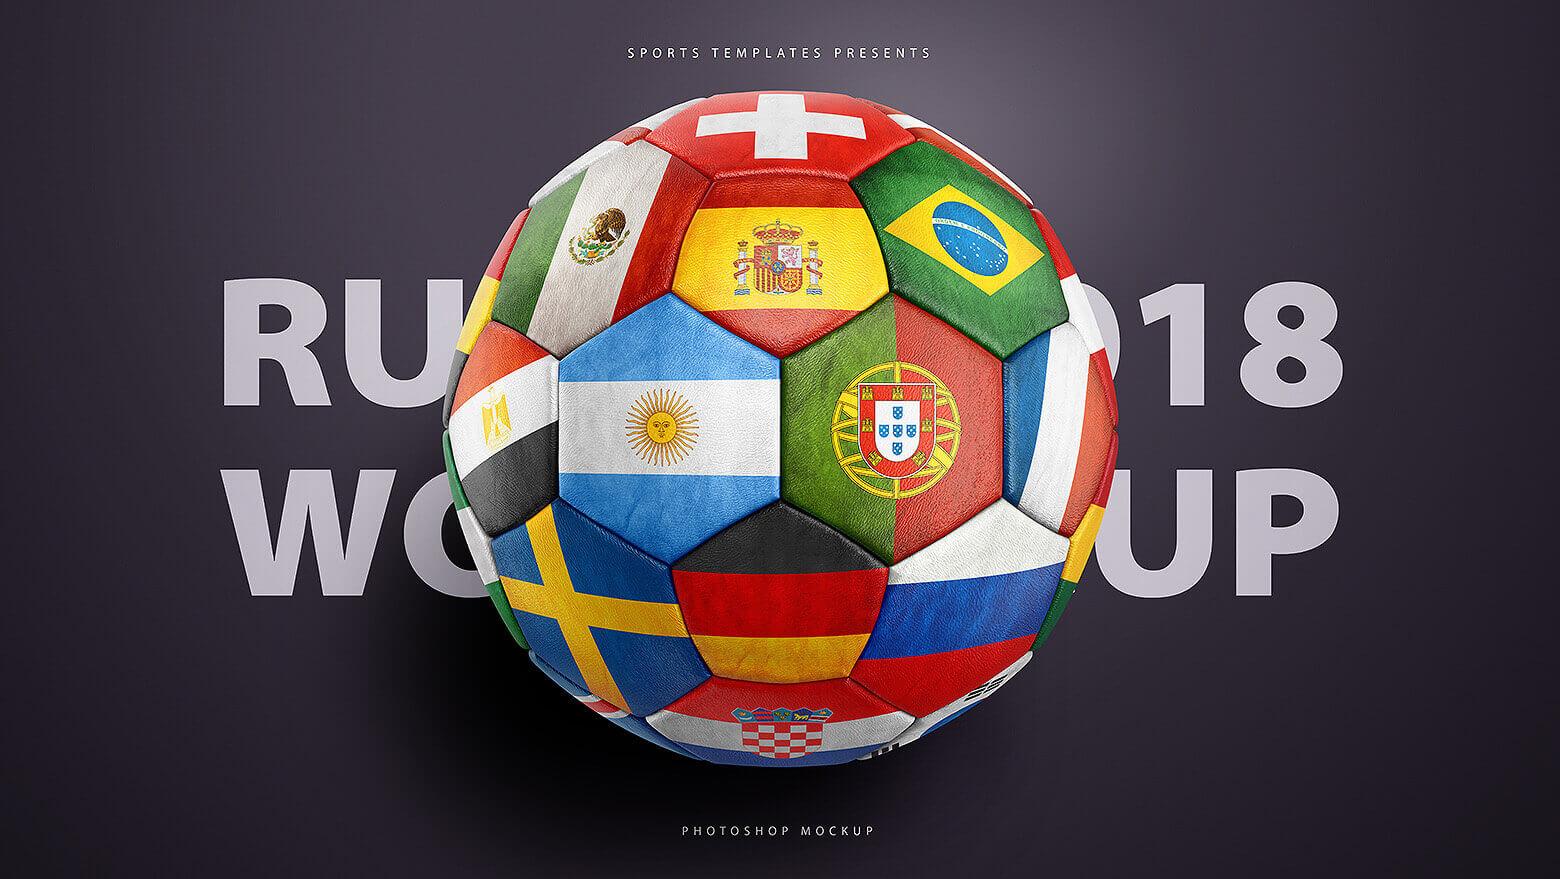 Good Football Ball World Cup 2018 - world-cup-2018-soccer-football-ball-mockup-template  Pic_249740 .jpg